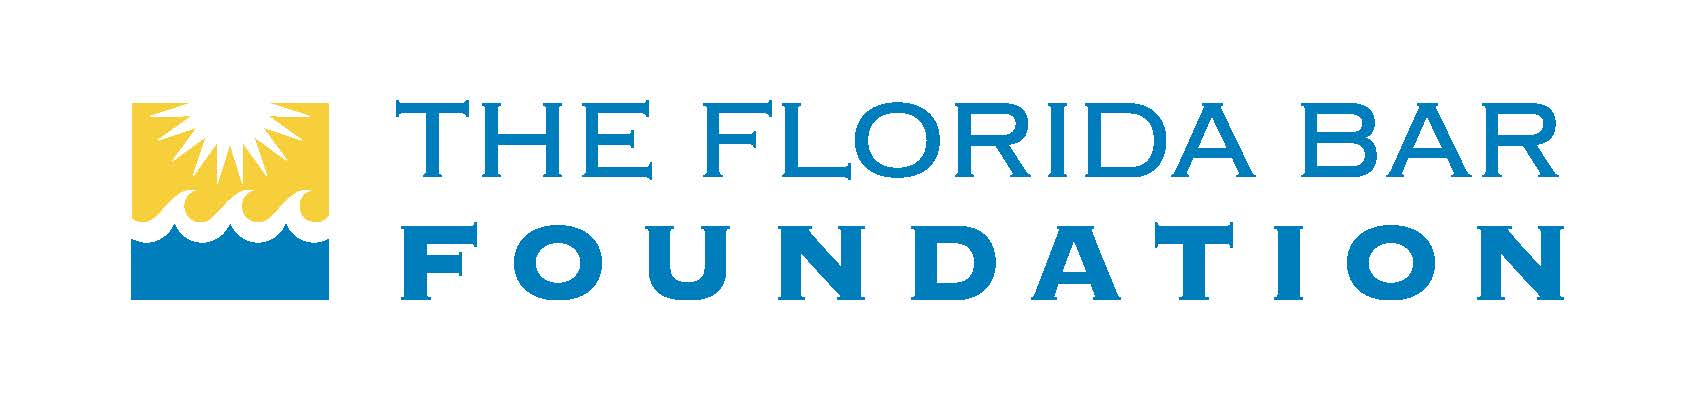 The Florida Bar Foundation